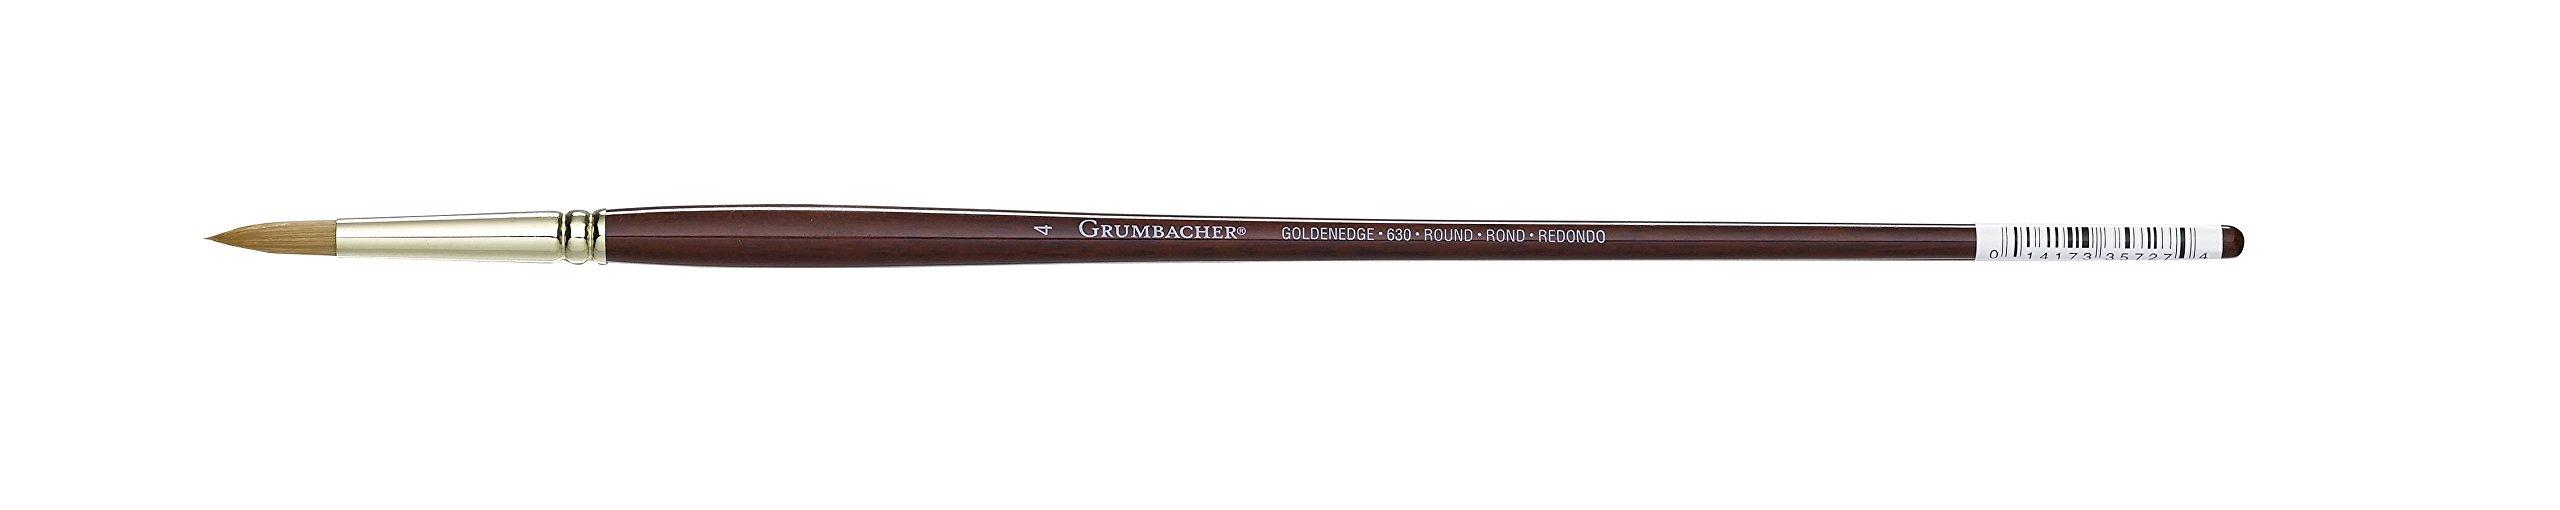 Grumbacher Goldenedge Golden Toray Round Oil and Acrylic Brush, Synthetic Bristles, Size 4 (630R4G)